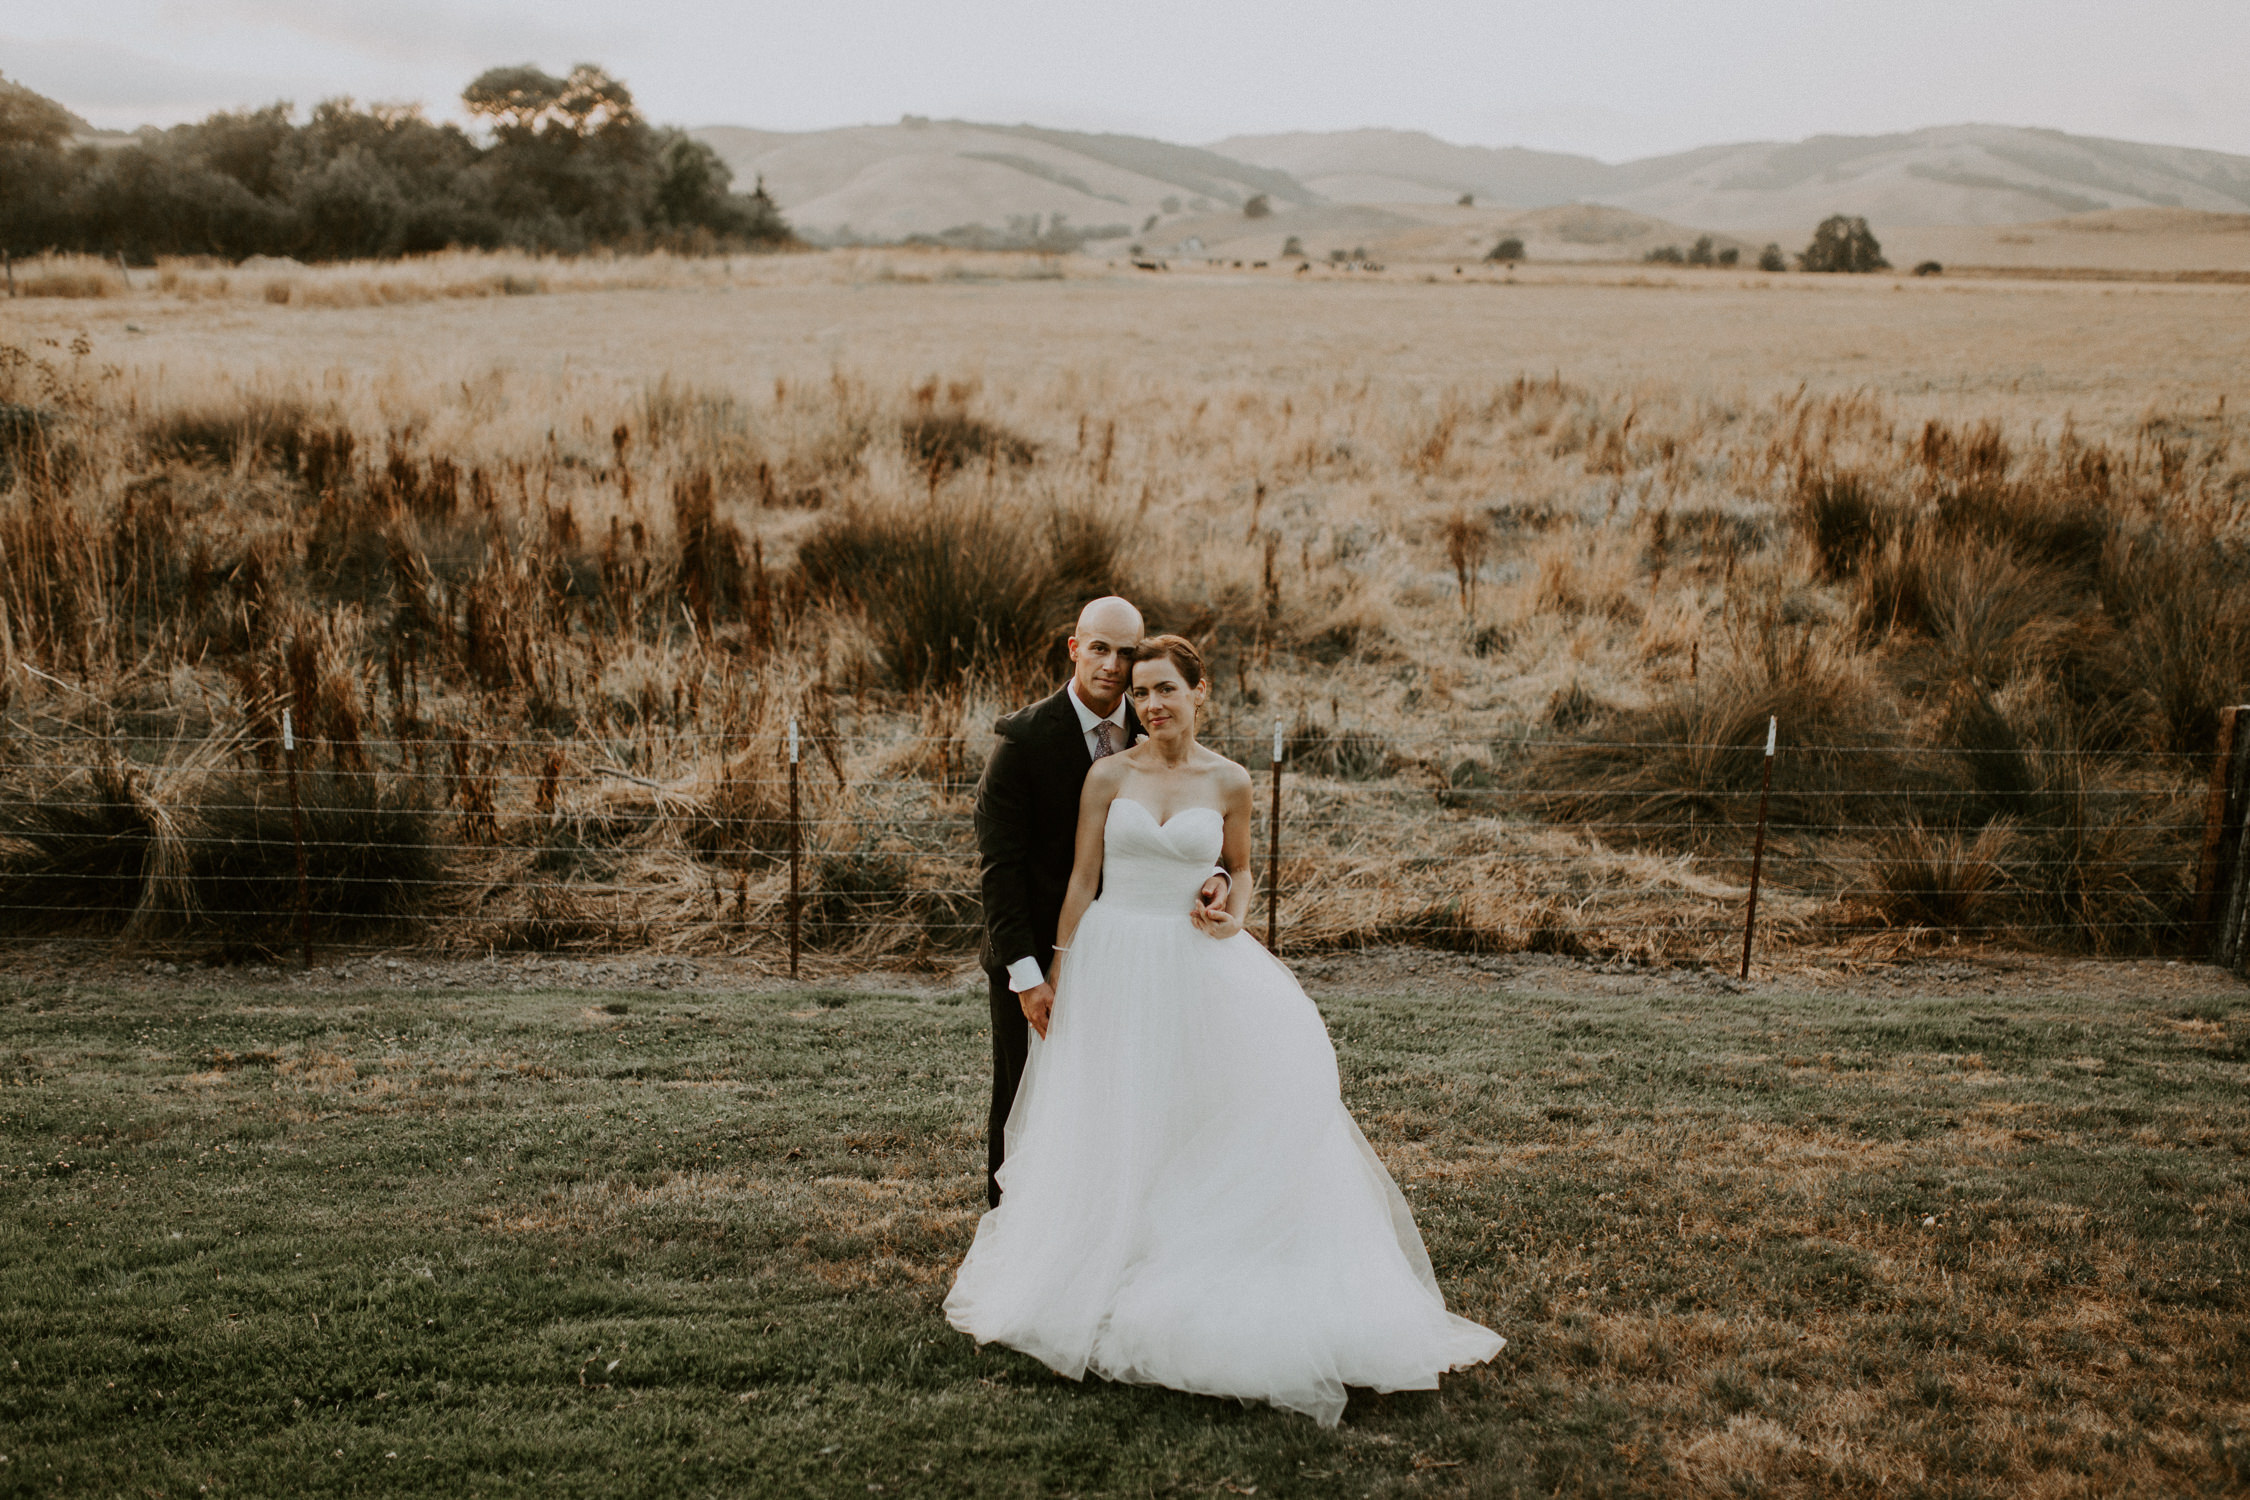 couple-wedding-marin-french-cheese-petaluma-california_0101.jpg